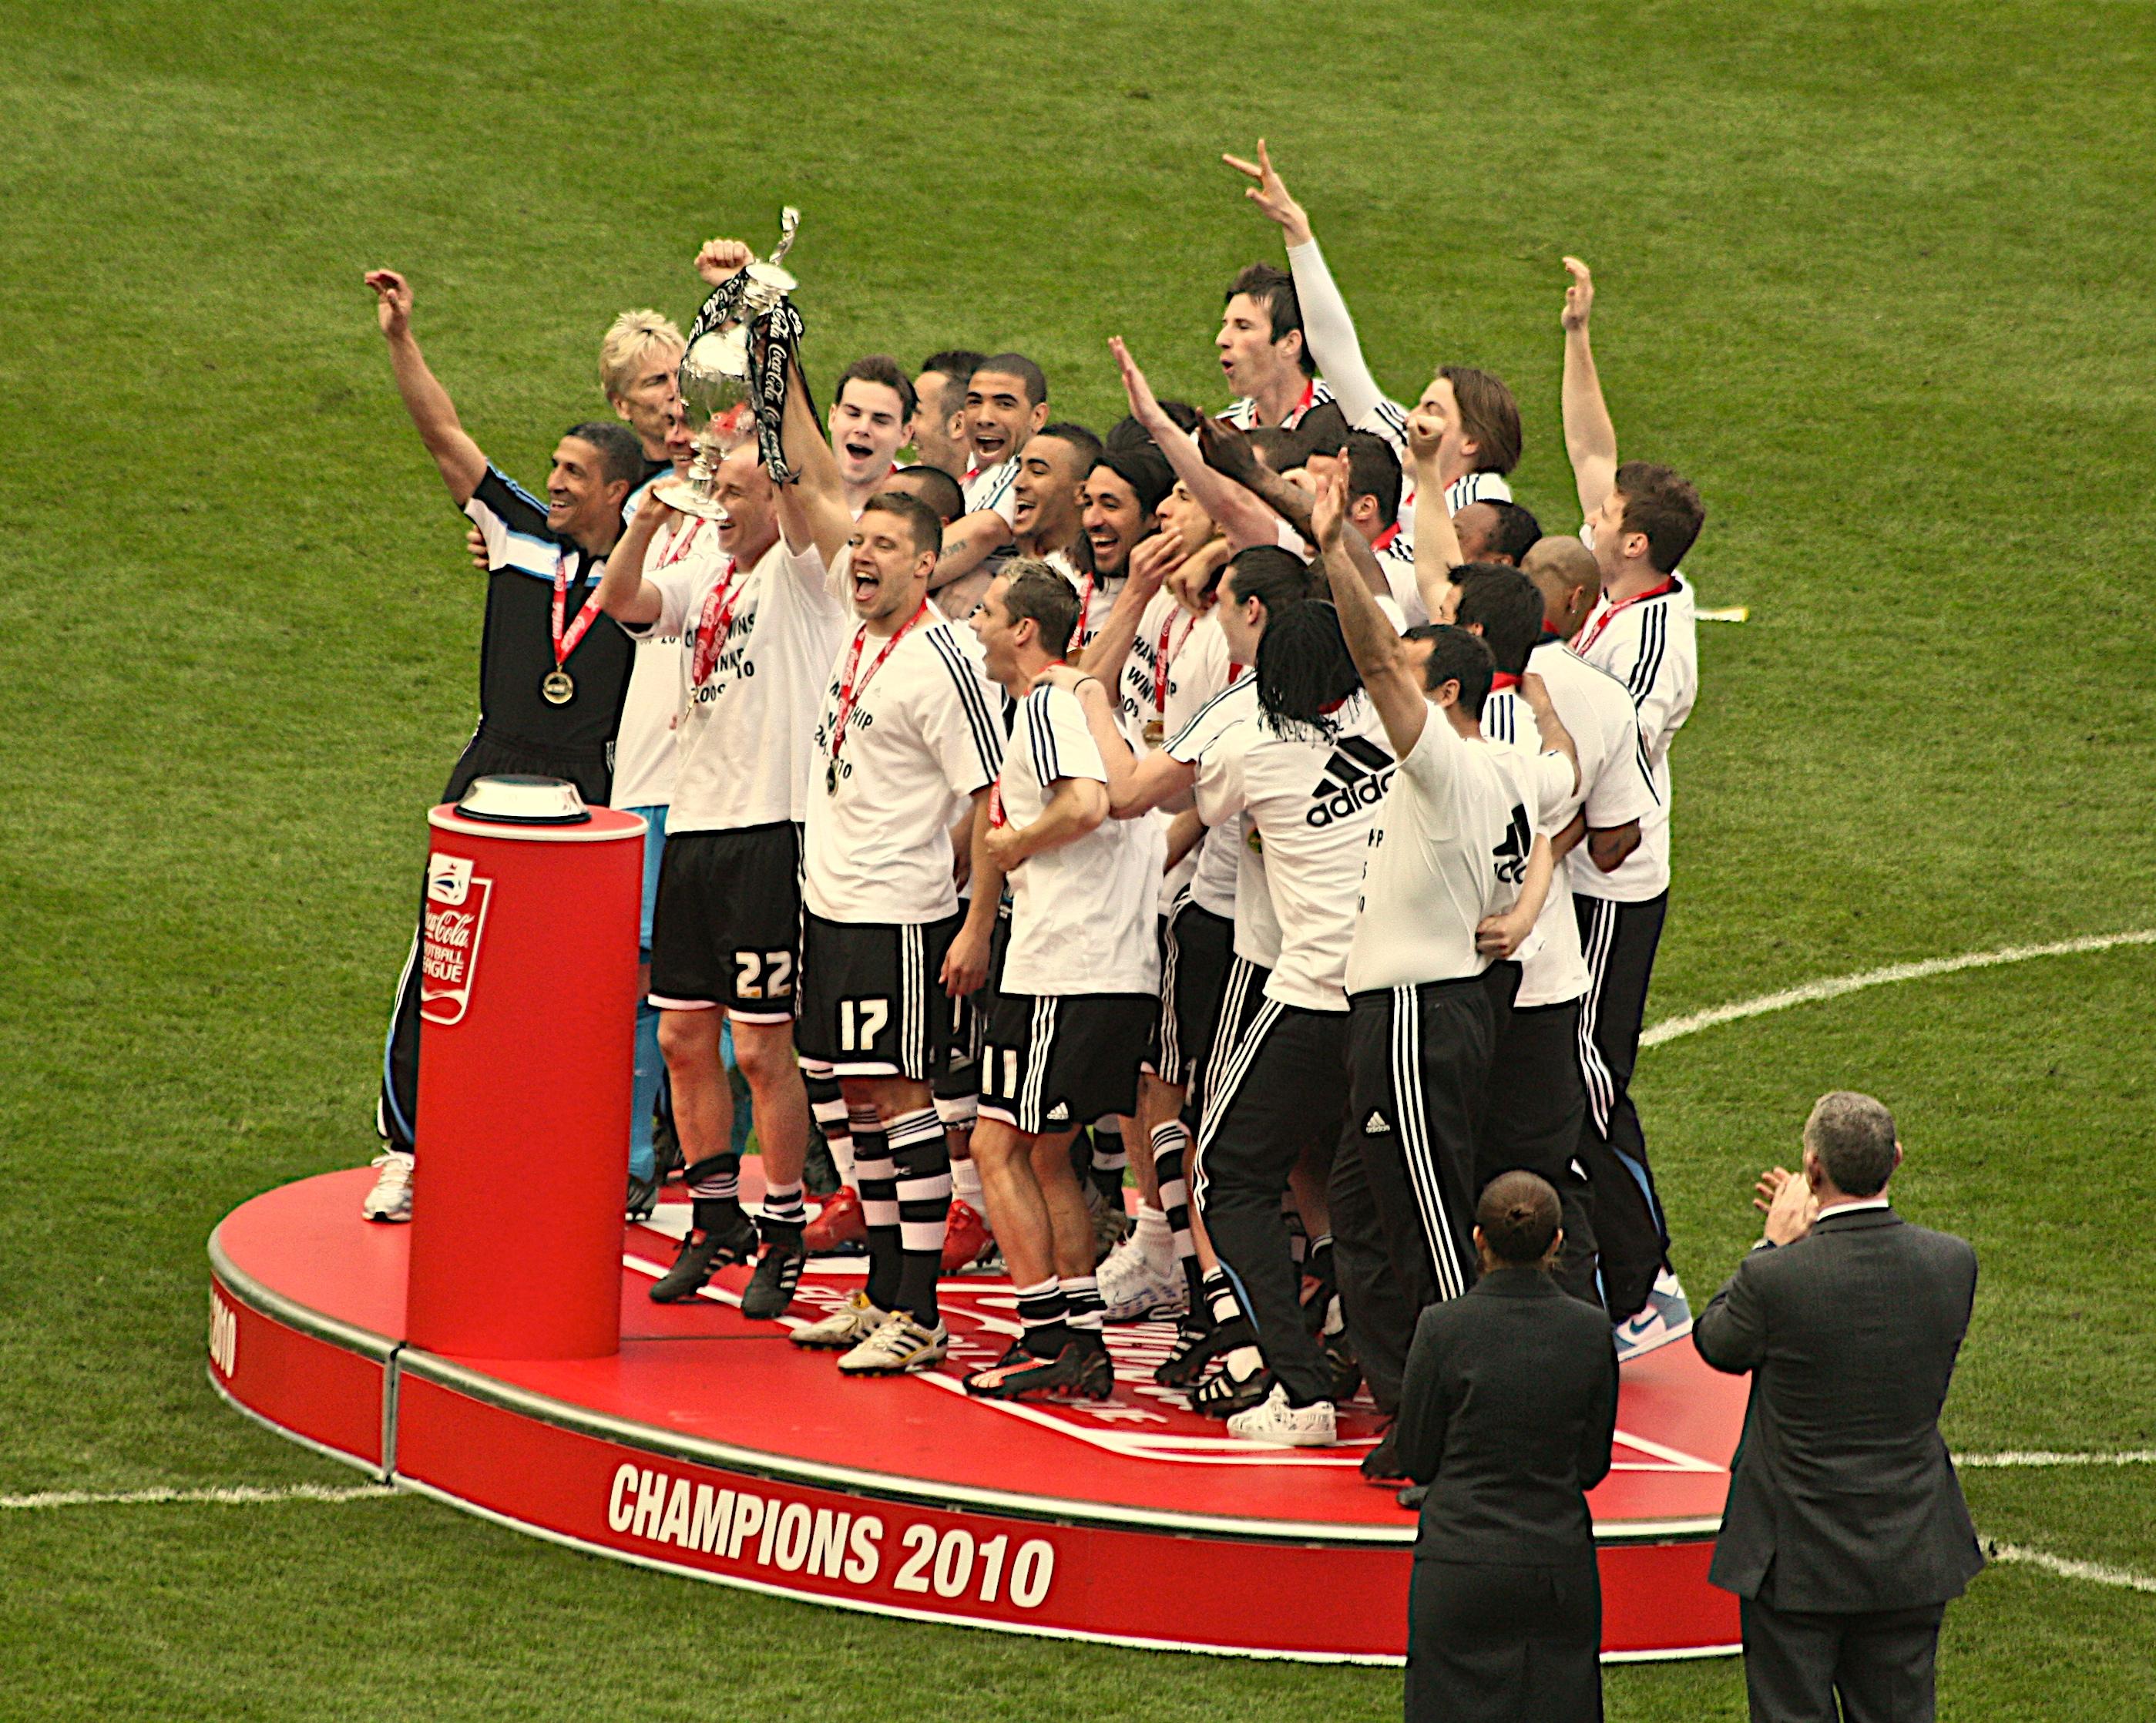 newcastle united - championship winners.jpg